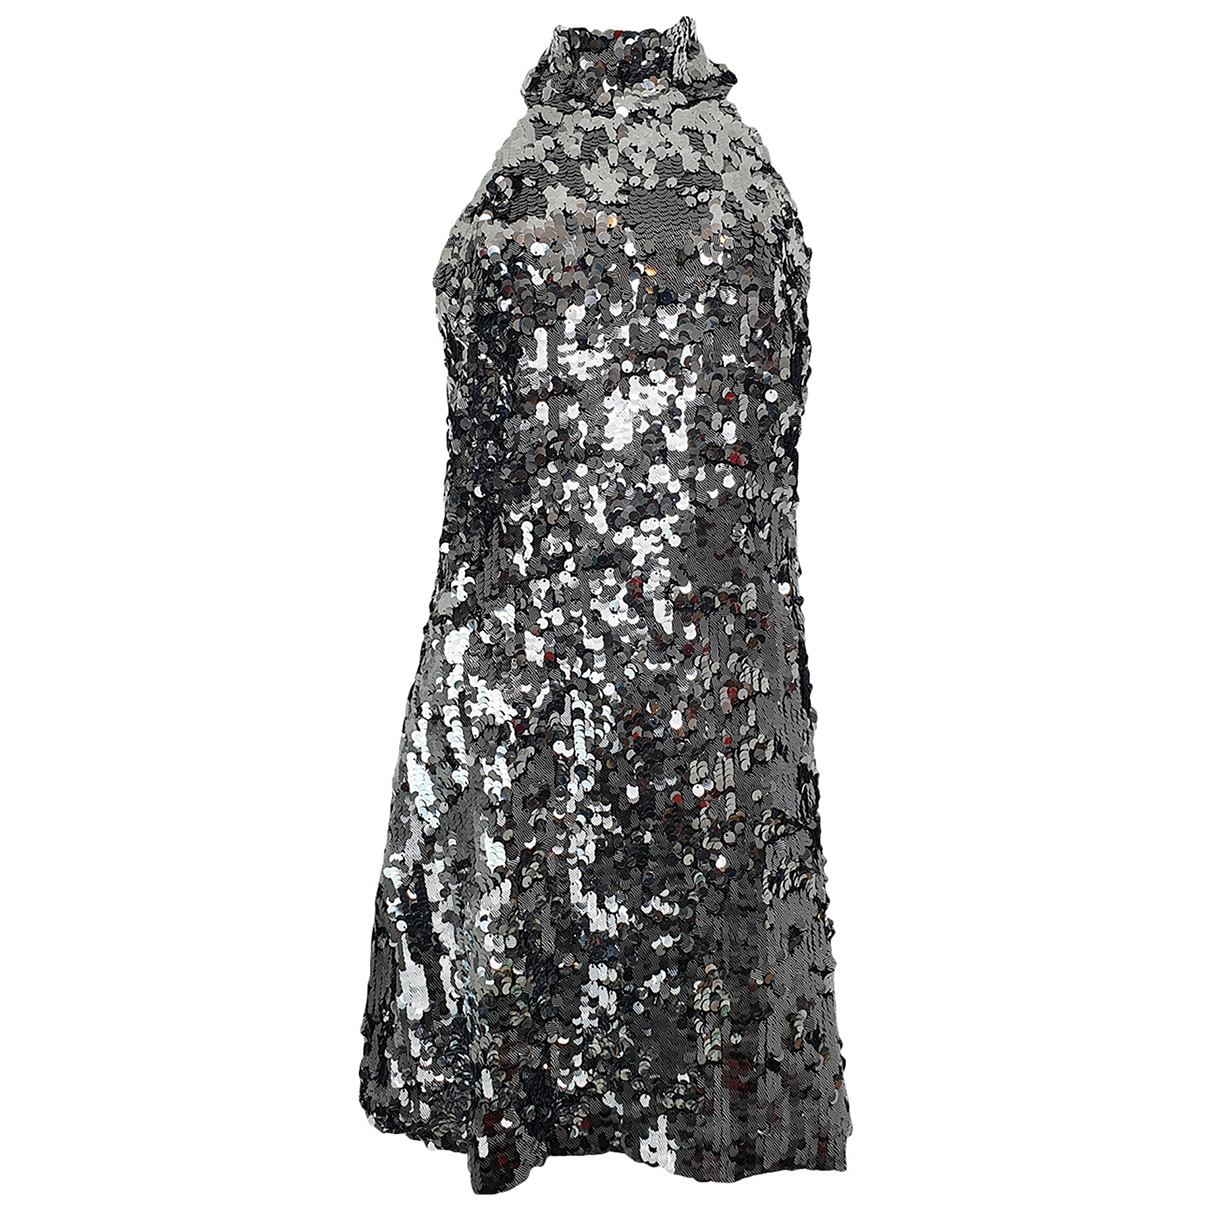 Galvan London \N Silver Glitter dress for Women 38 FR